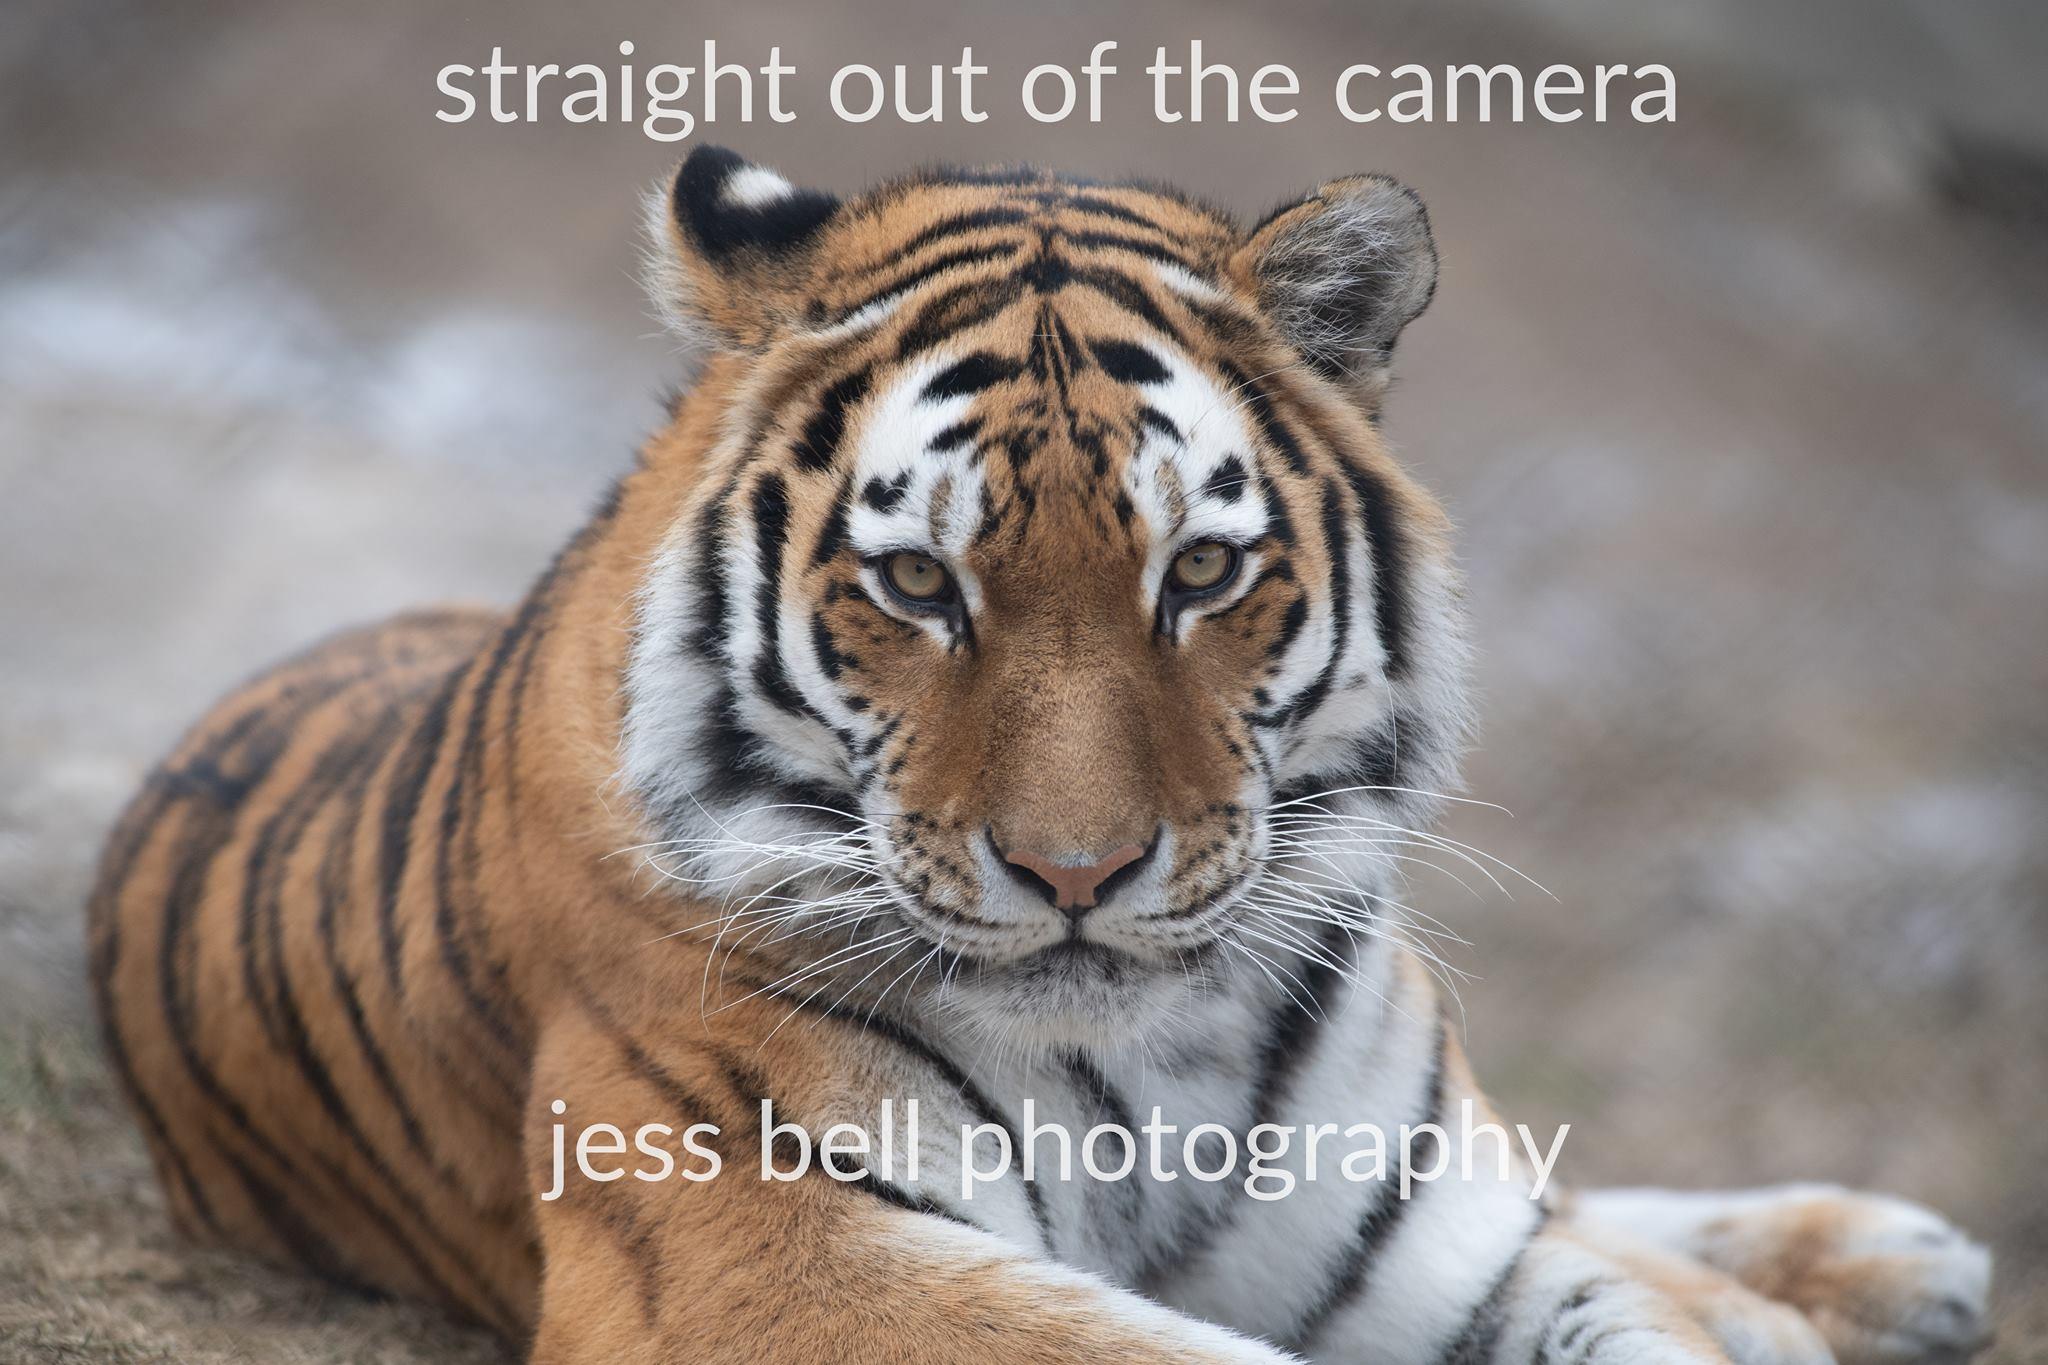 Artistic Animal Photography - Jess Bell Photography - Toronto, Ontario